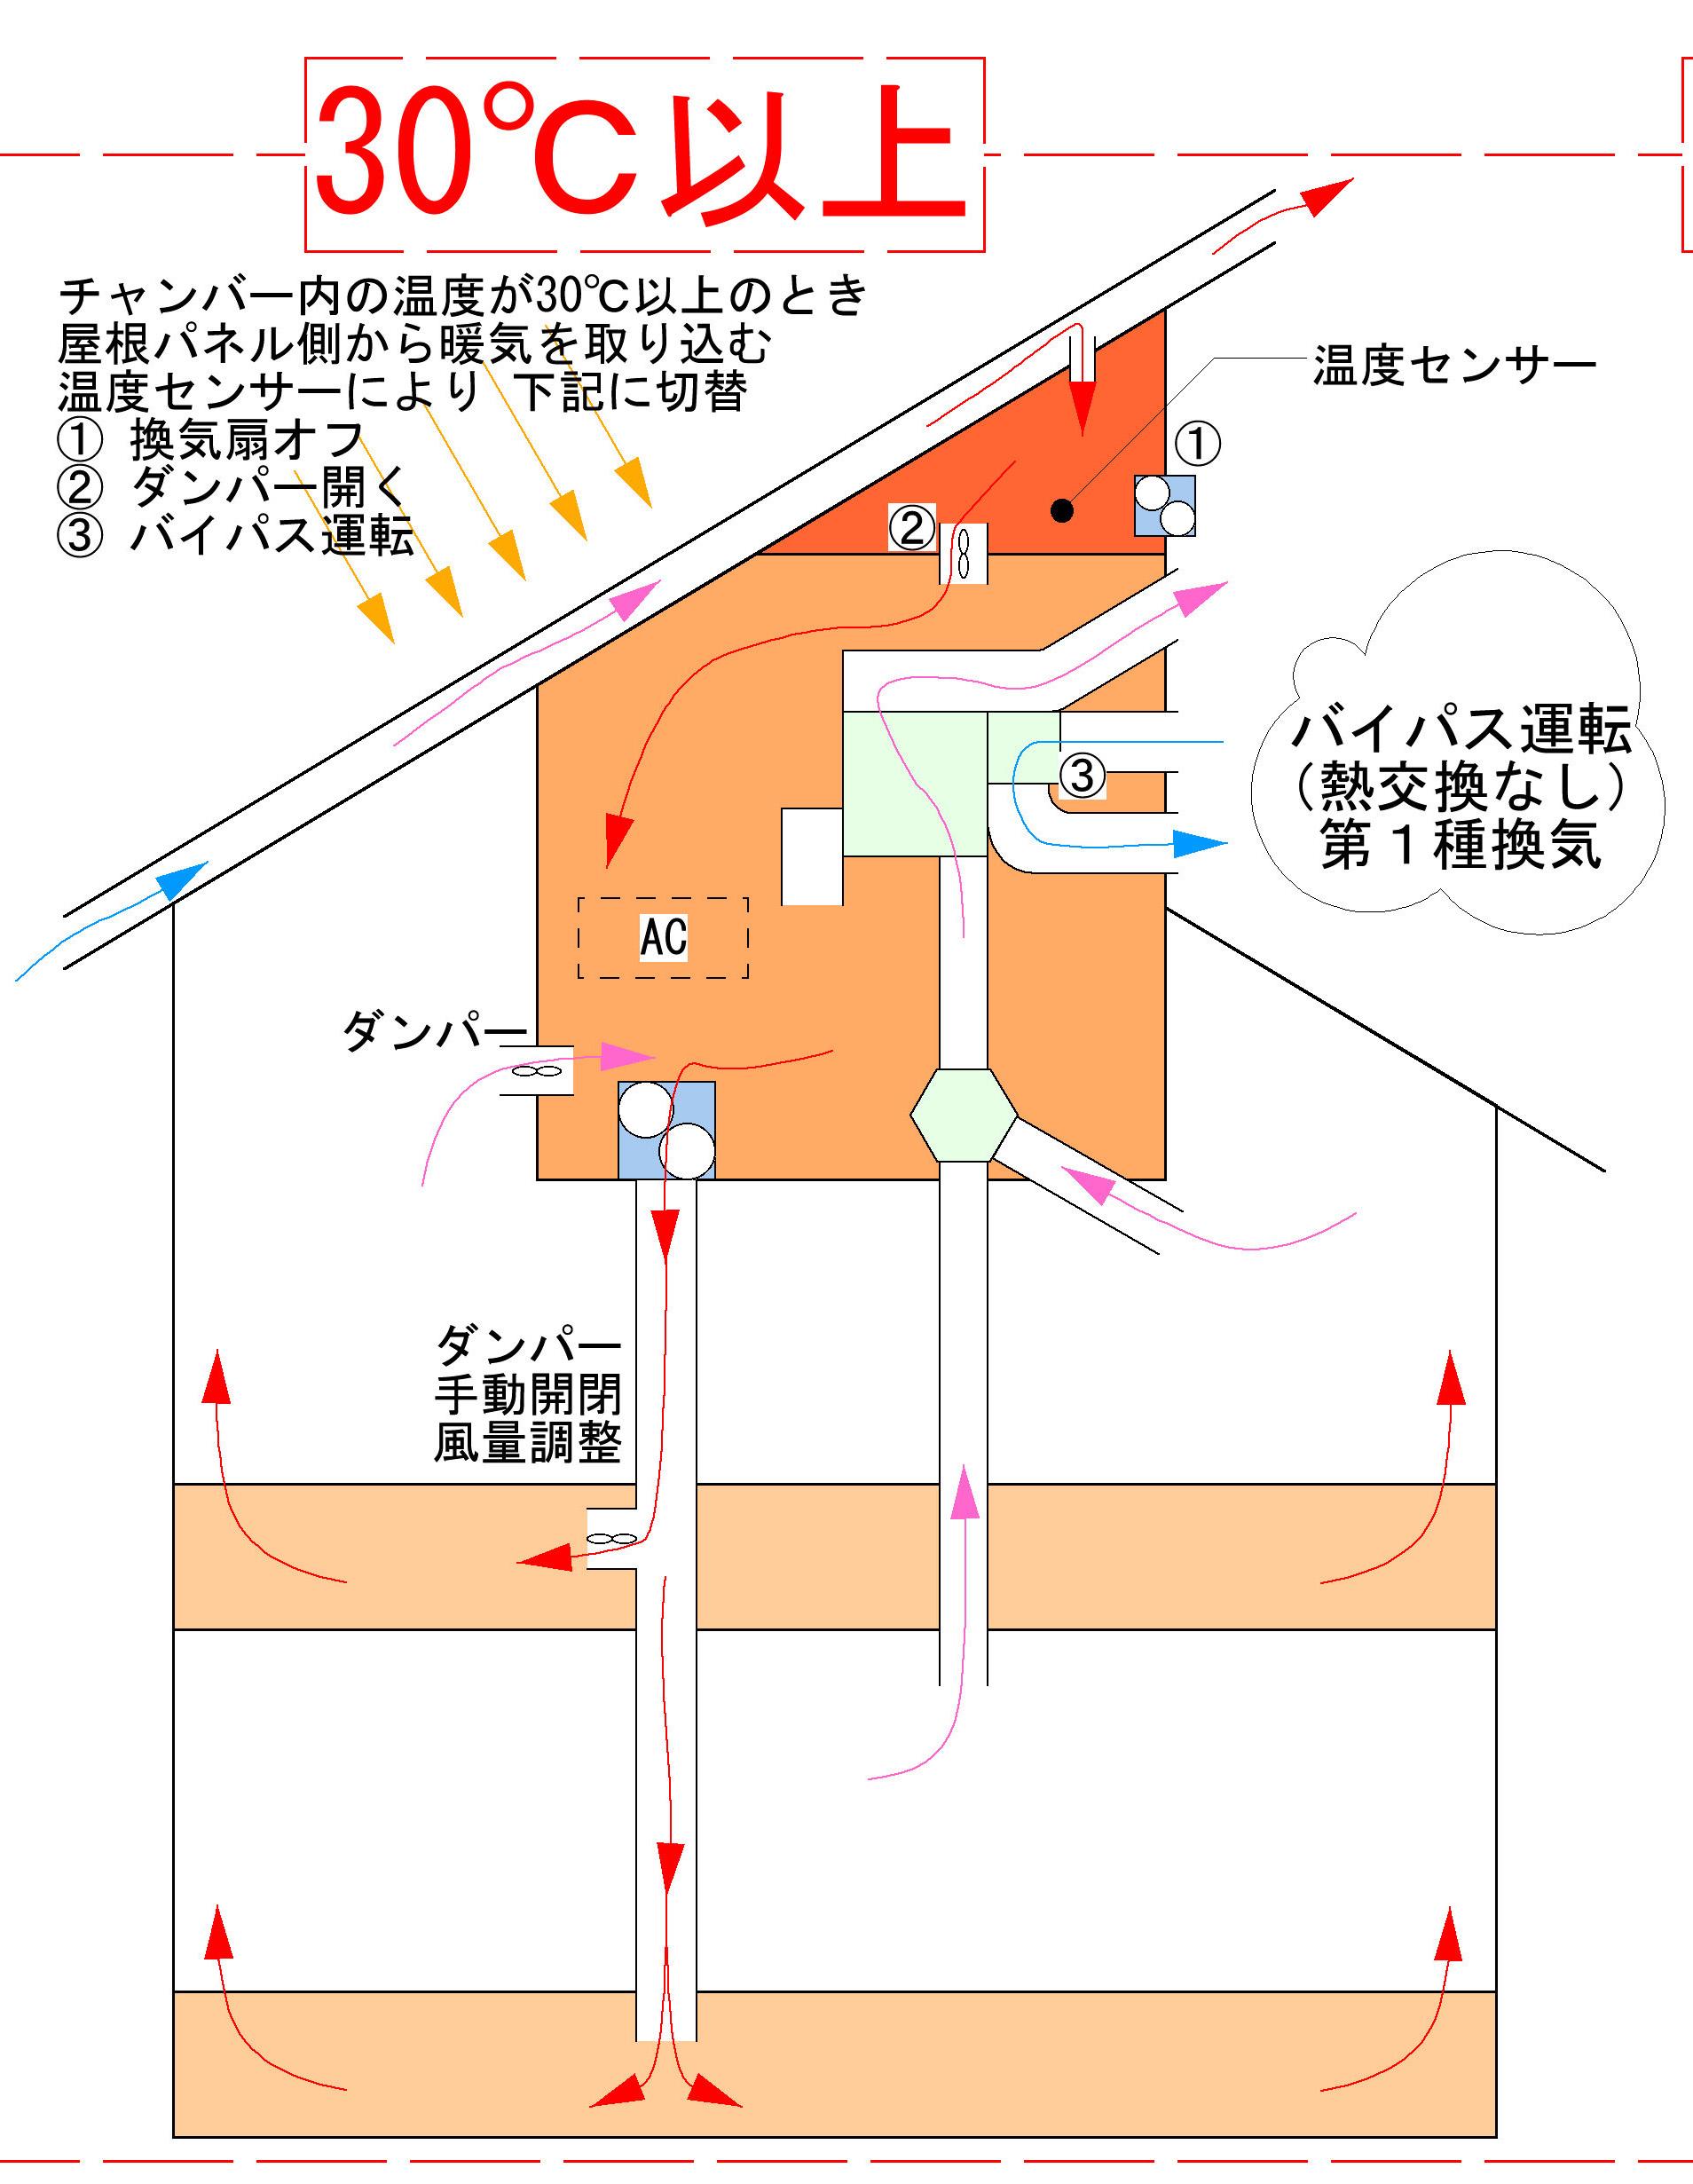 Q1住宅姫路:暖房 1_e0054299_13405121.jpg